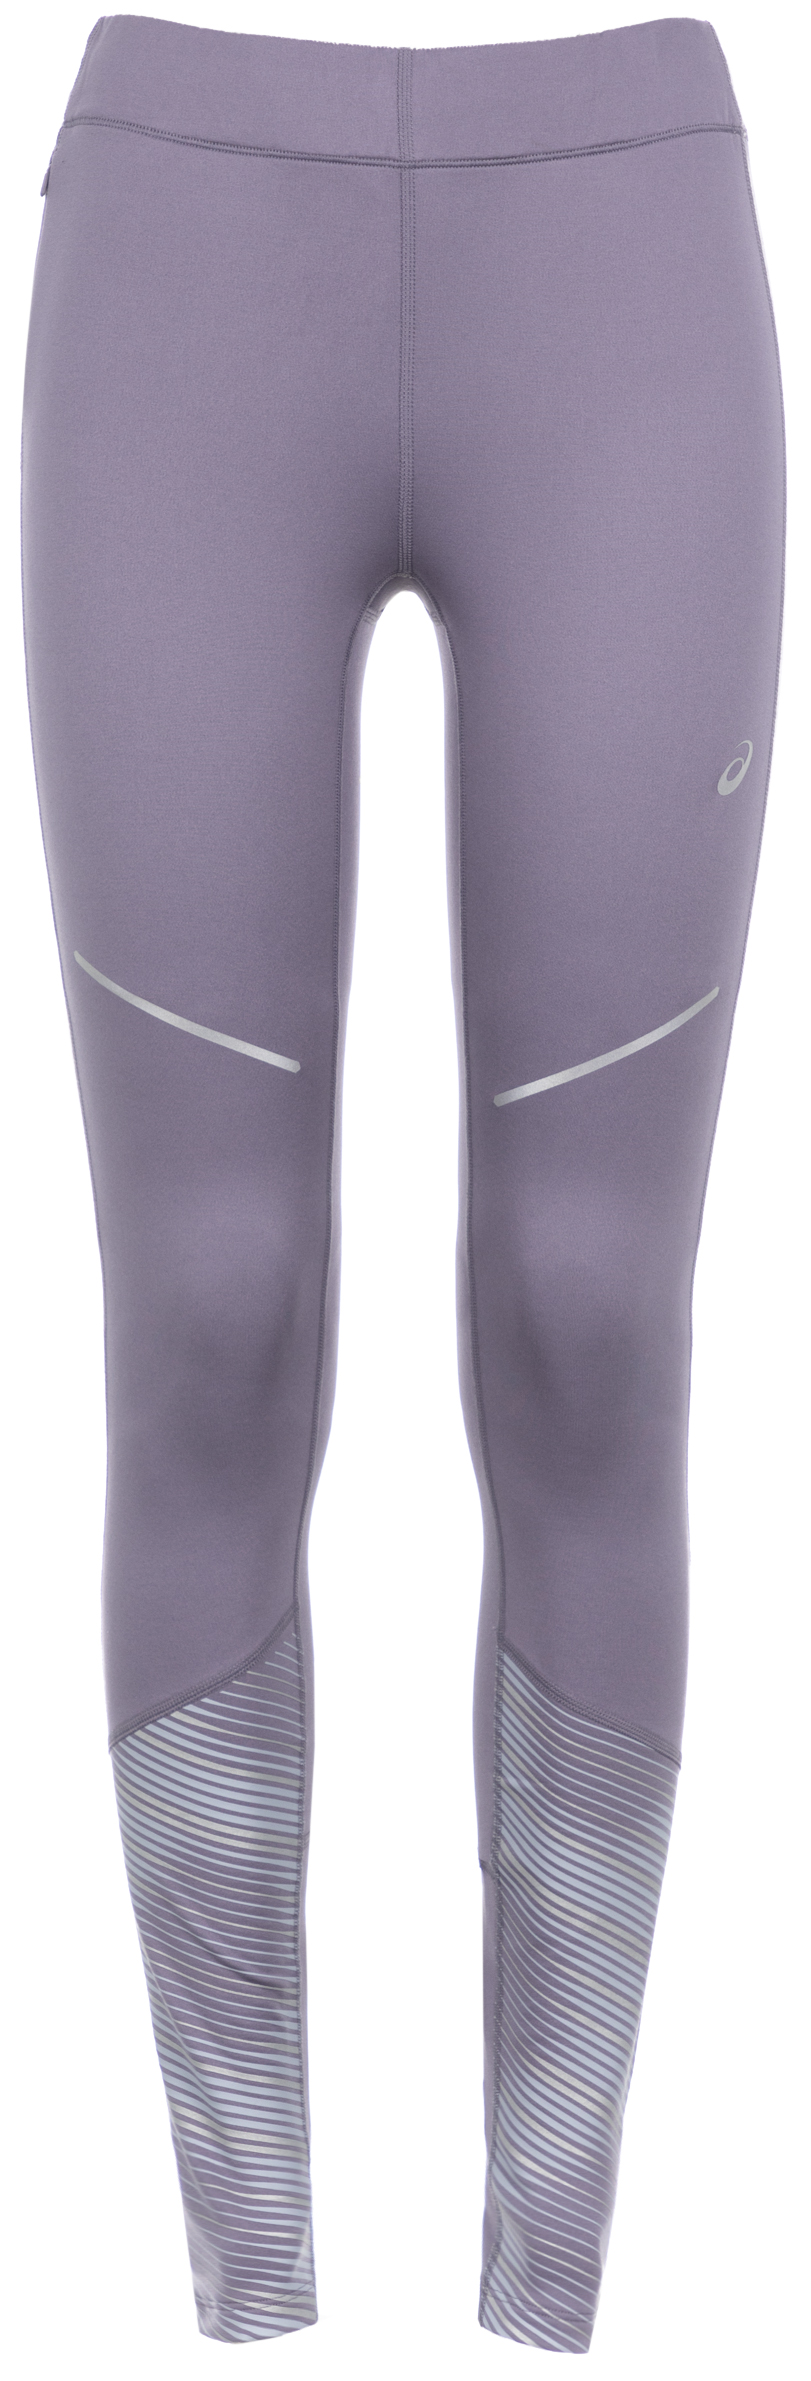 Фото - ASICS Легинсы женские ASICS Lite-Show 2, размер 42-44 available from 10 11 asics comprehensive training trousers 141218 1113